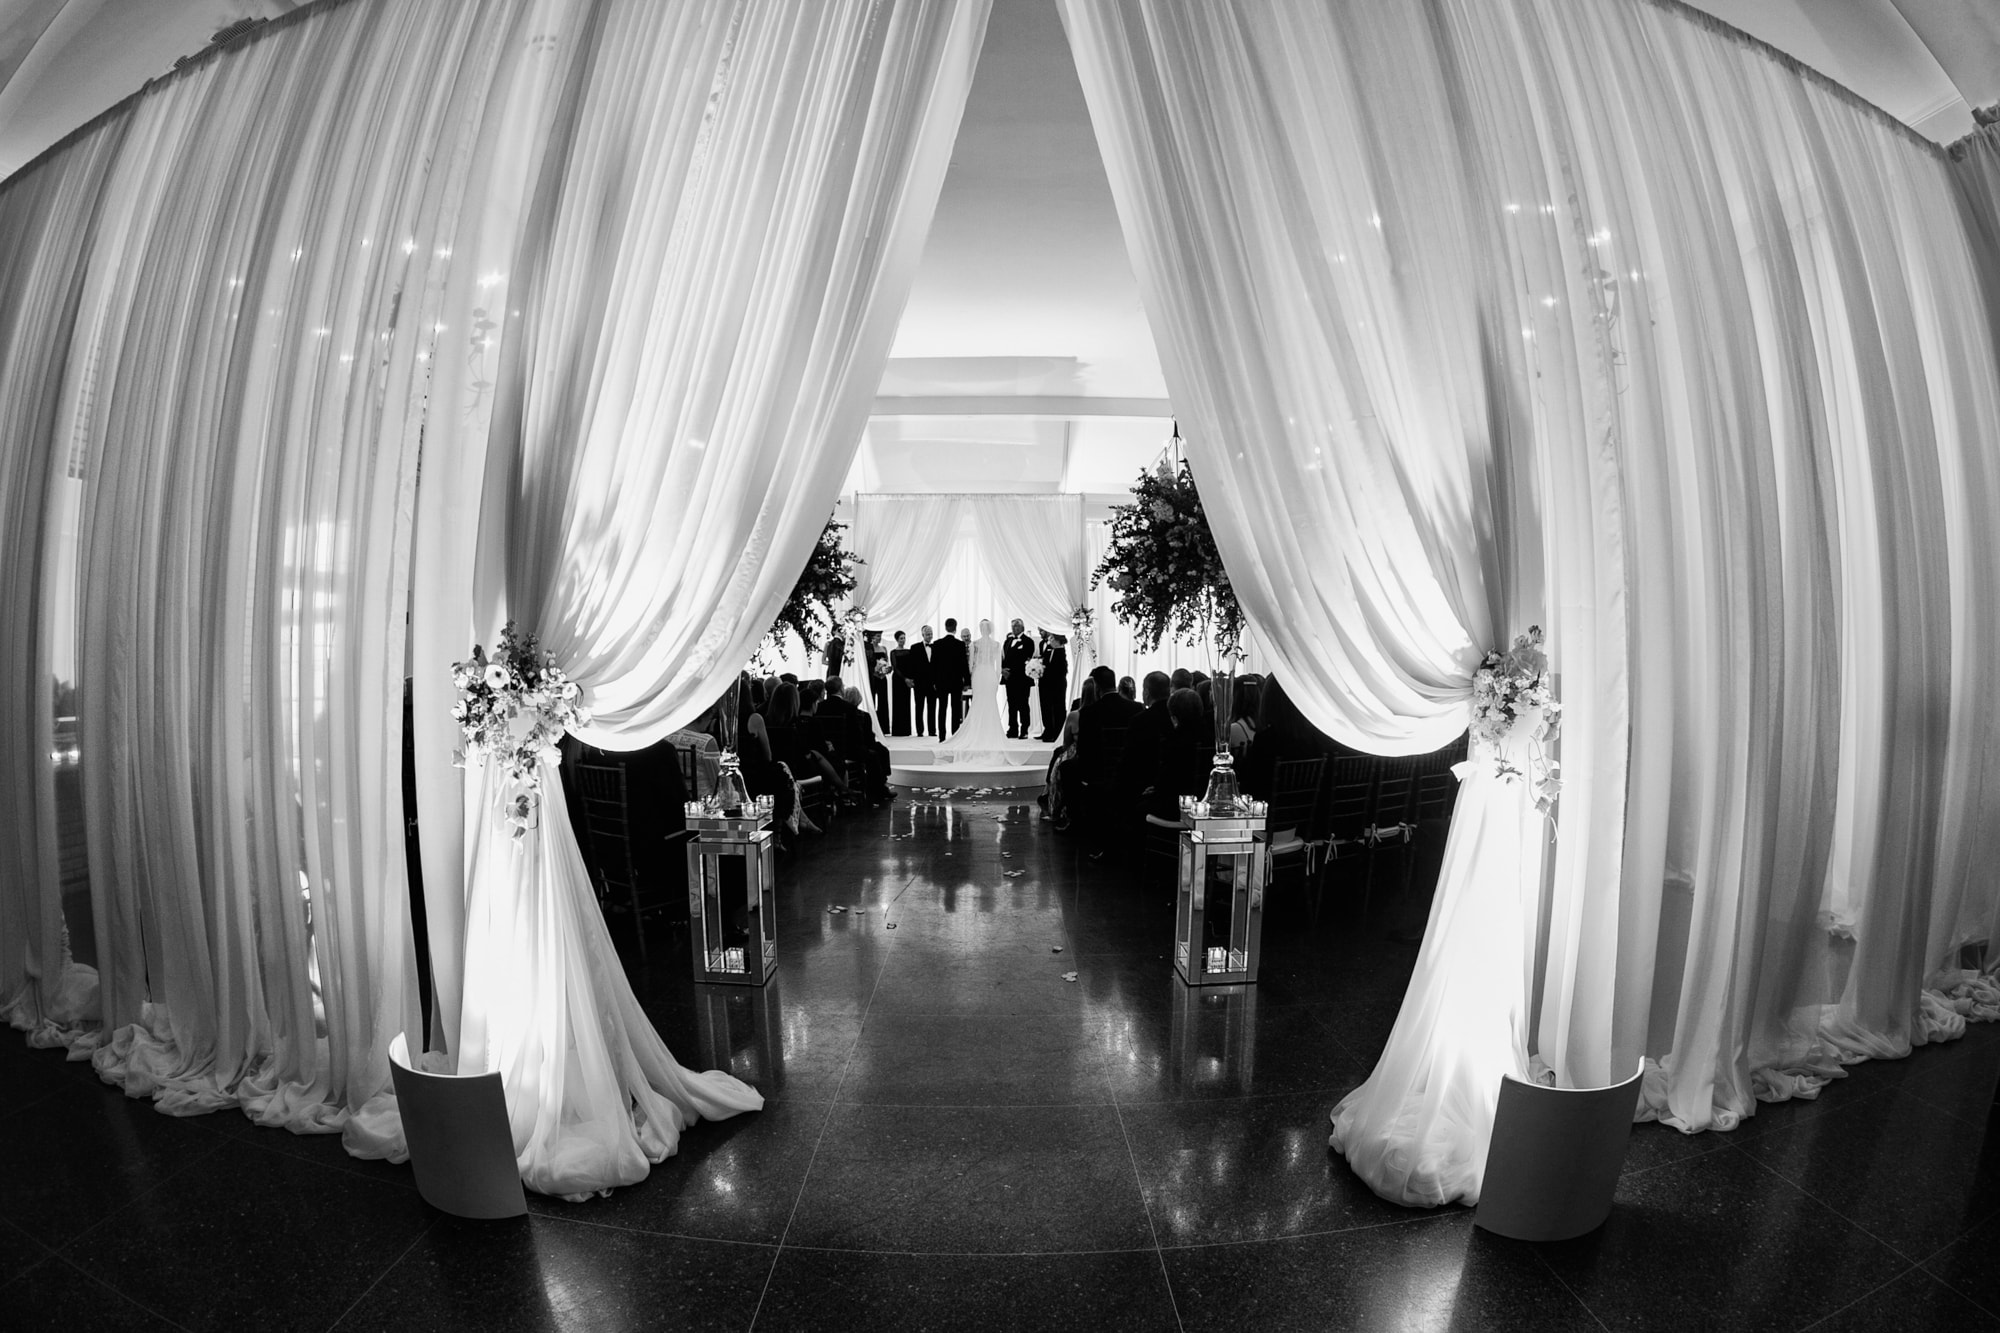 Dramatic black and white photo of wedding ceremony